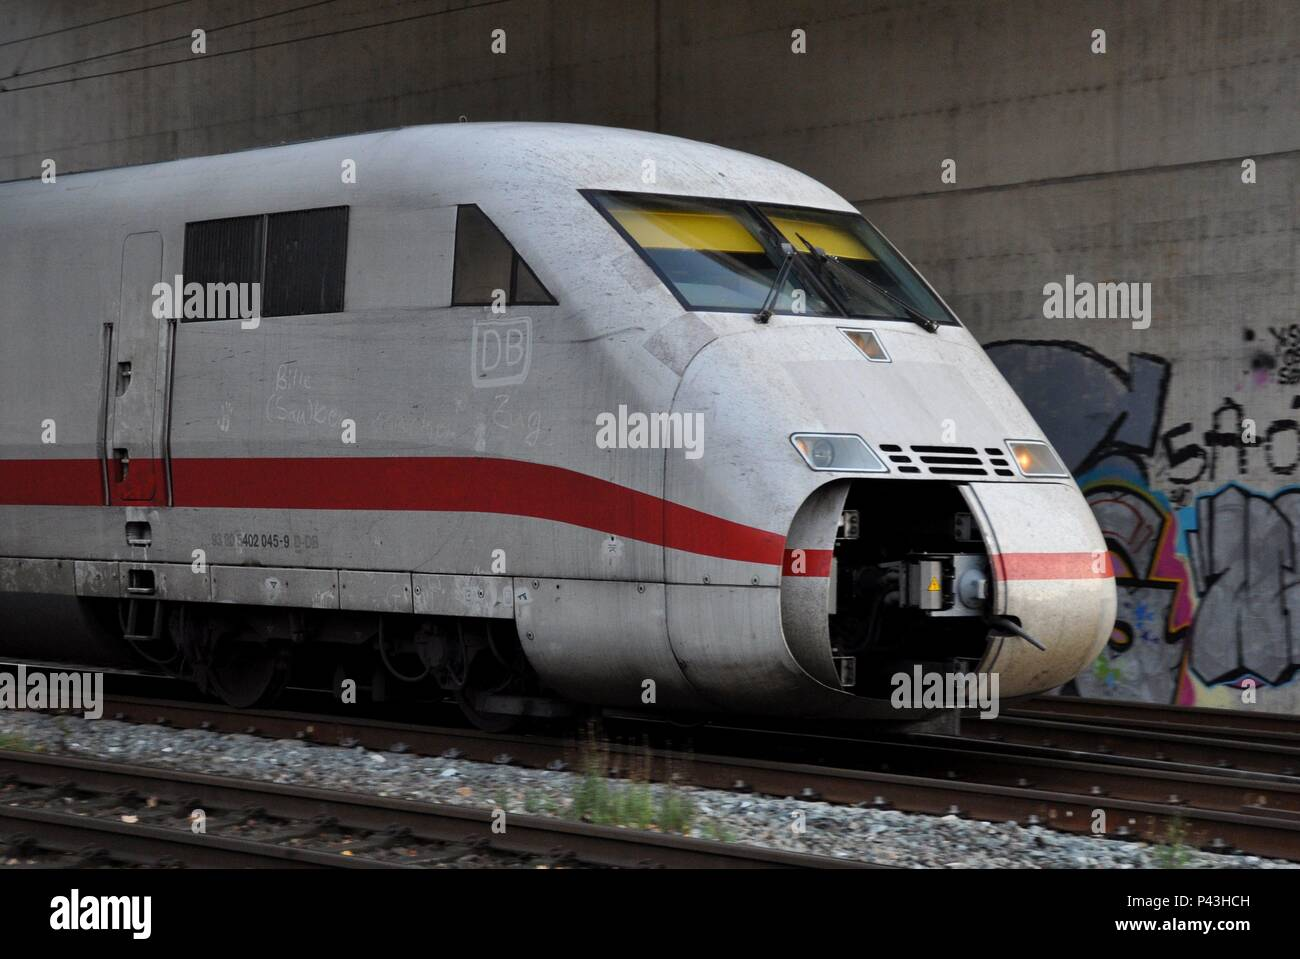 DB-Graffiti on a ICE train on 04.12.2015 in Scherte-Westhofen - Germany. | usage worldwide - Stock Image